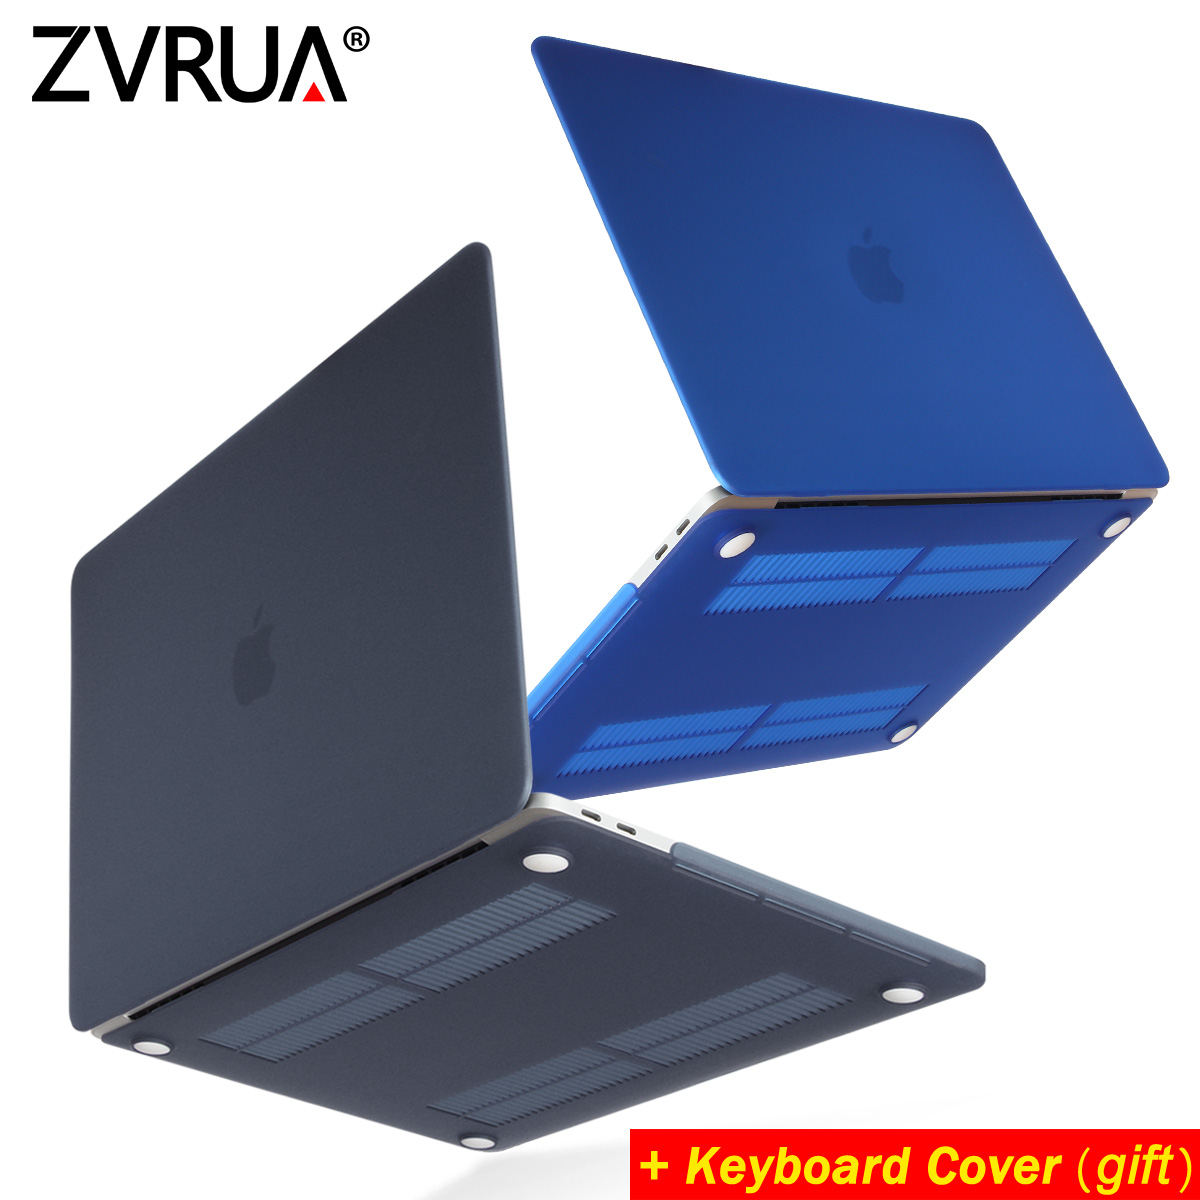 ZVRUA חם למכור מקרה נייד עבור אפל רשתית 11 12 13 15 עבור Mac ספר 13.3 inch עם מגע בר + מקלדת כיסוי